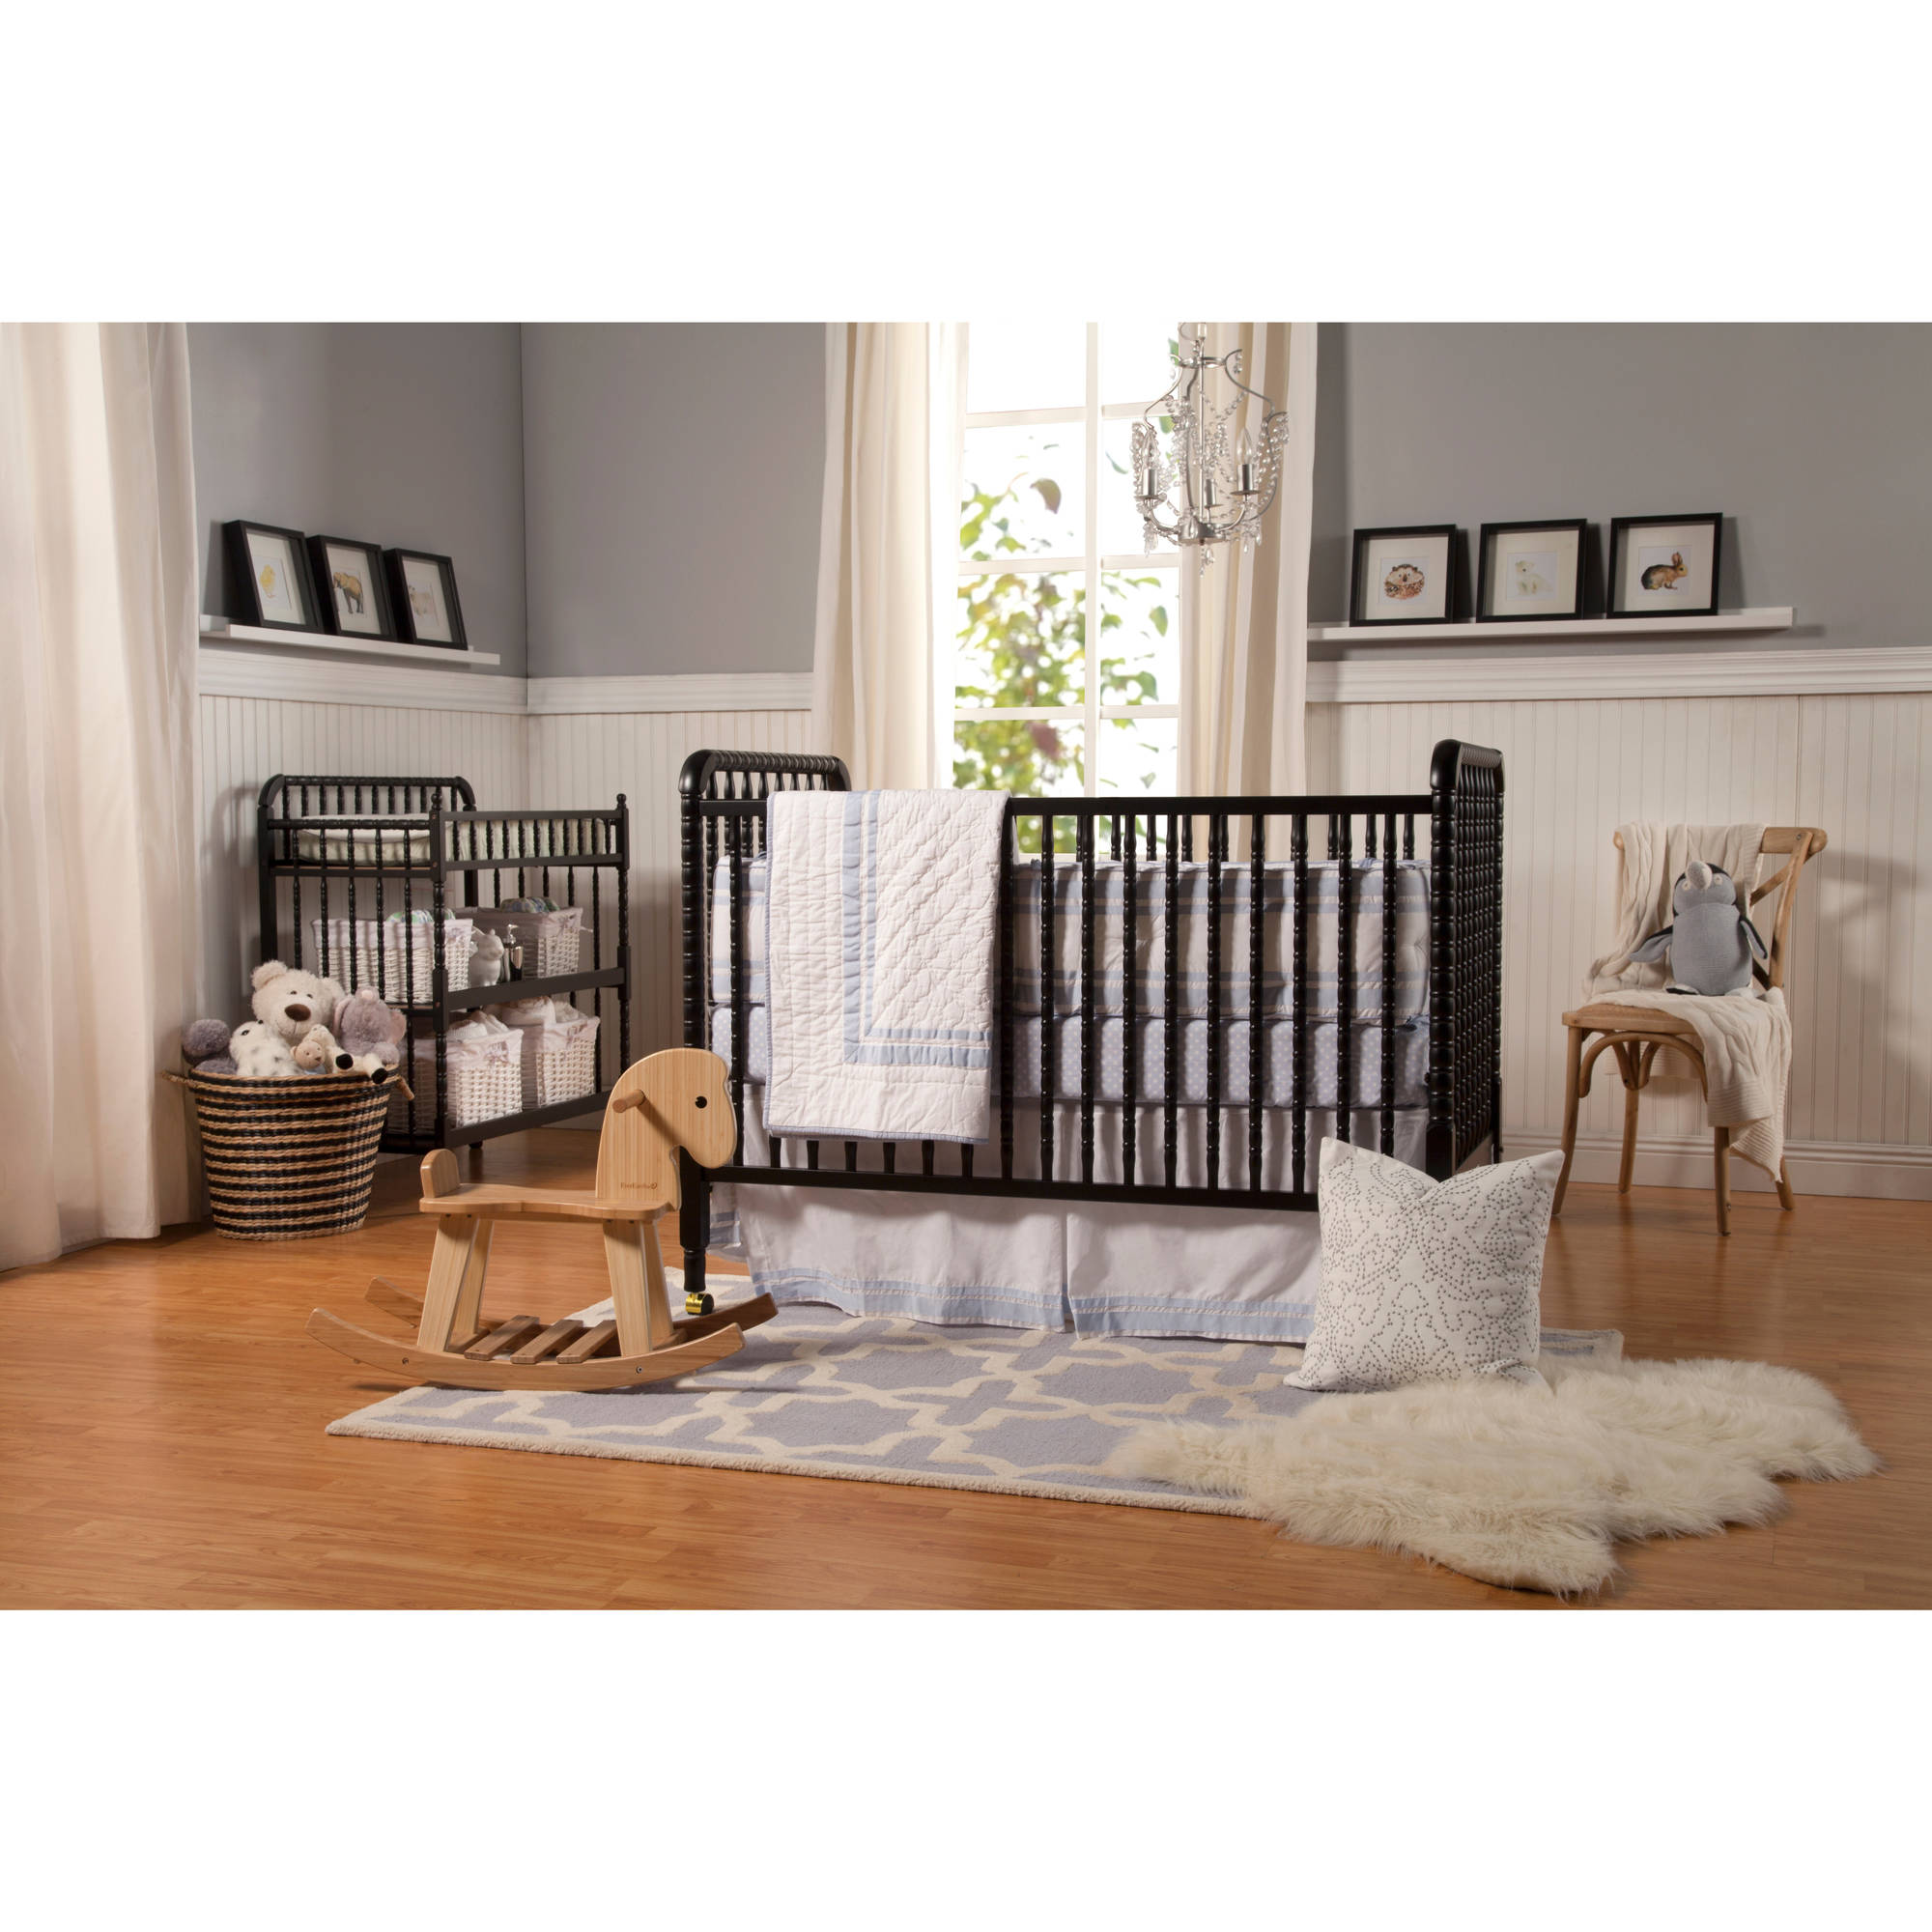 86 oak jenny lind crib